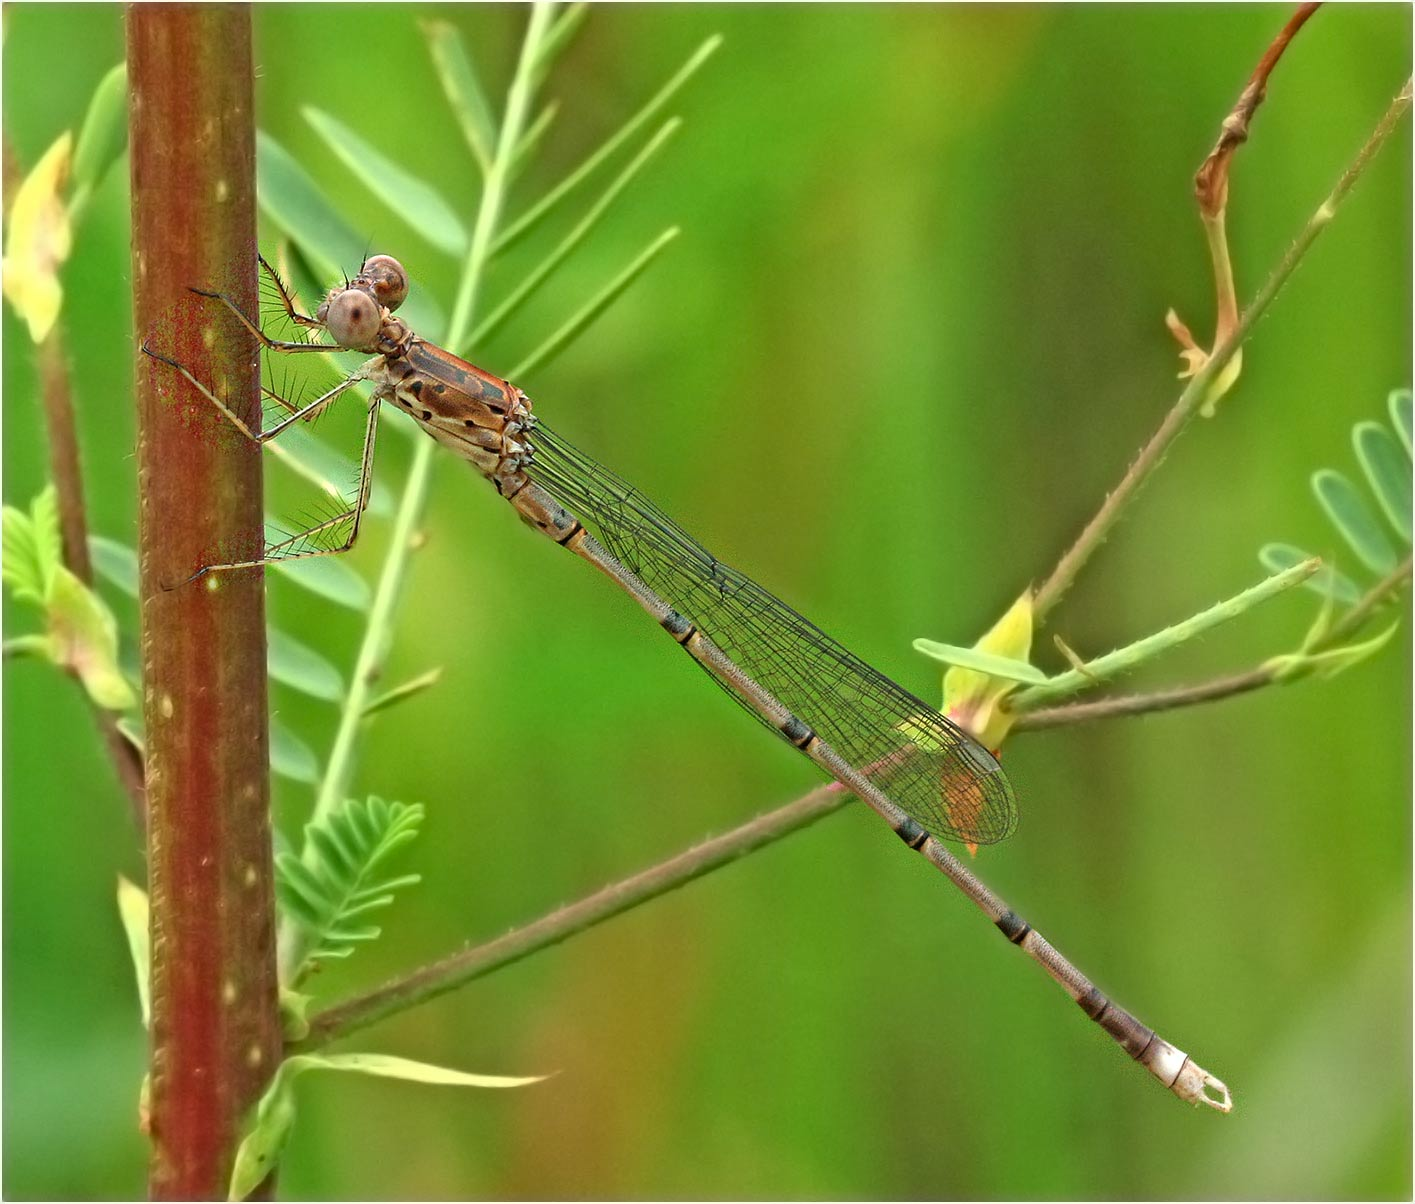 Lestes dissimulans mâle, Namibie, Kalambesa, 17/02/2020